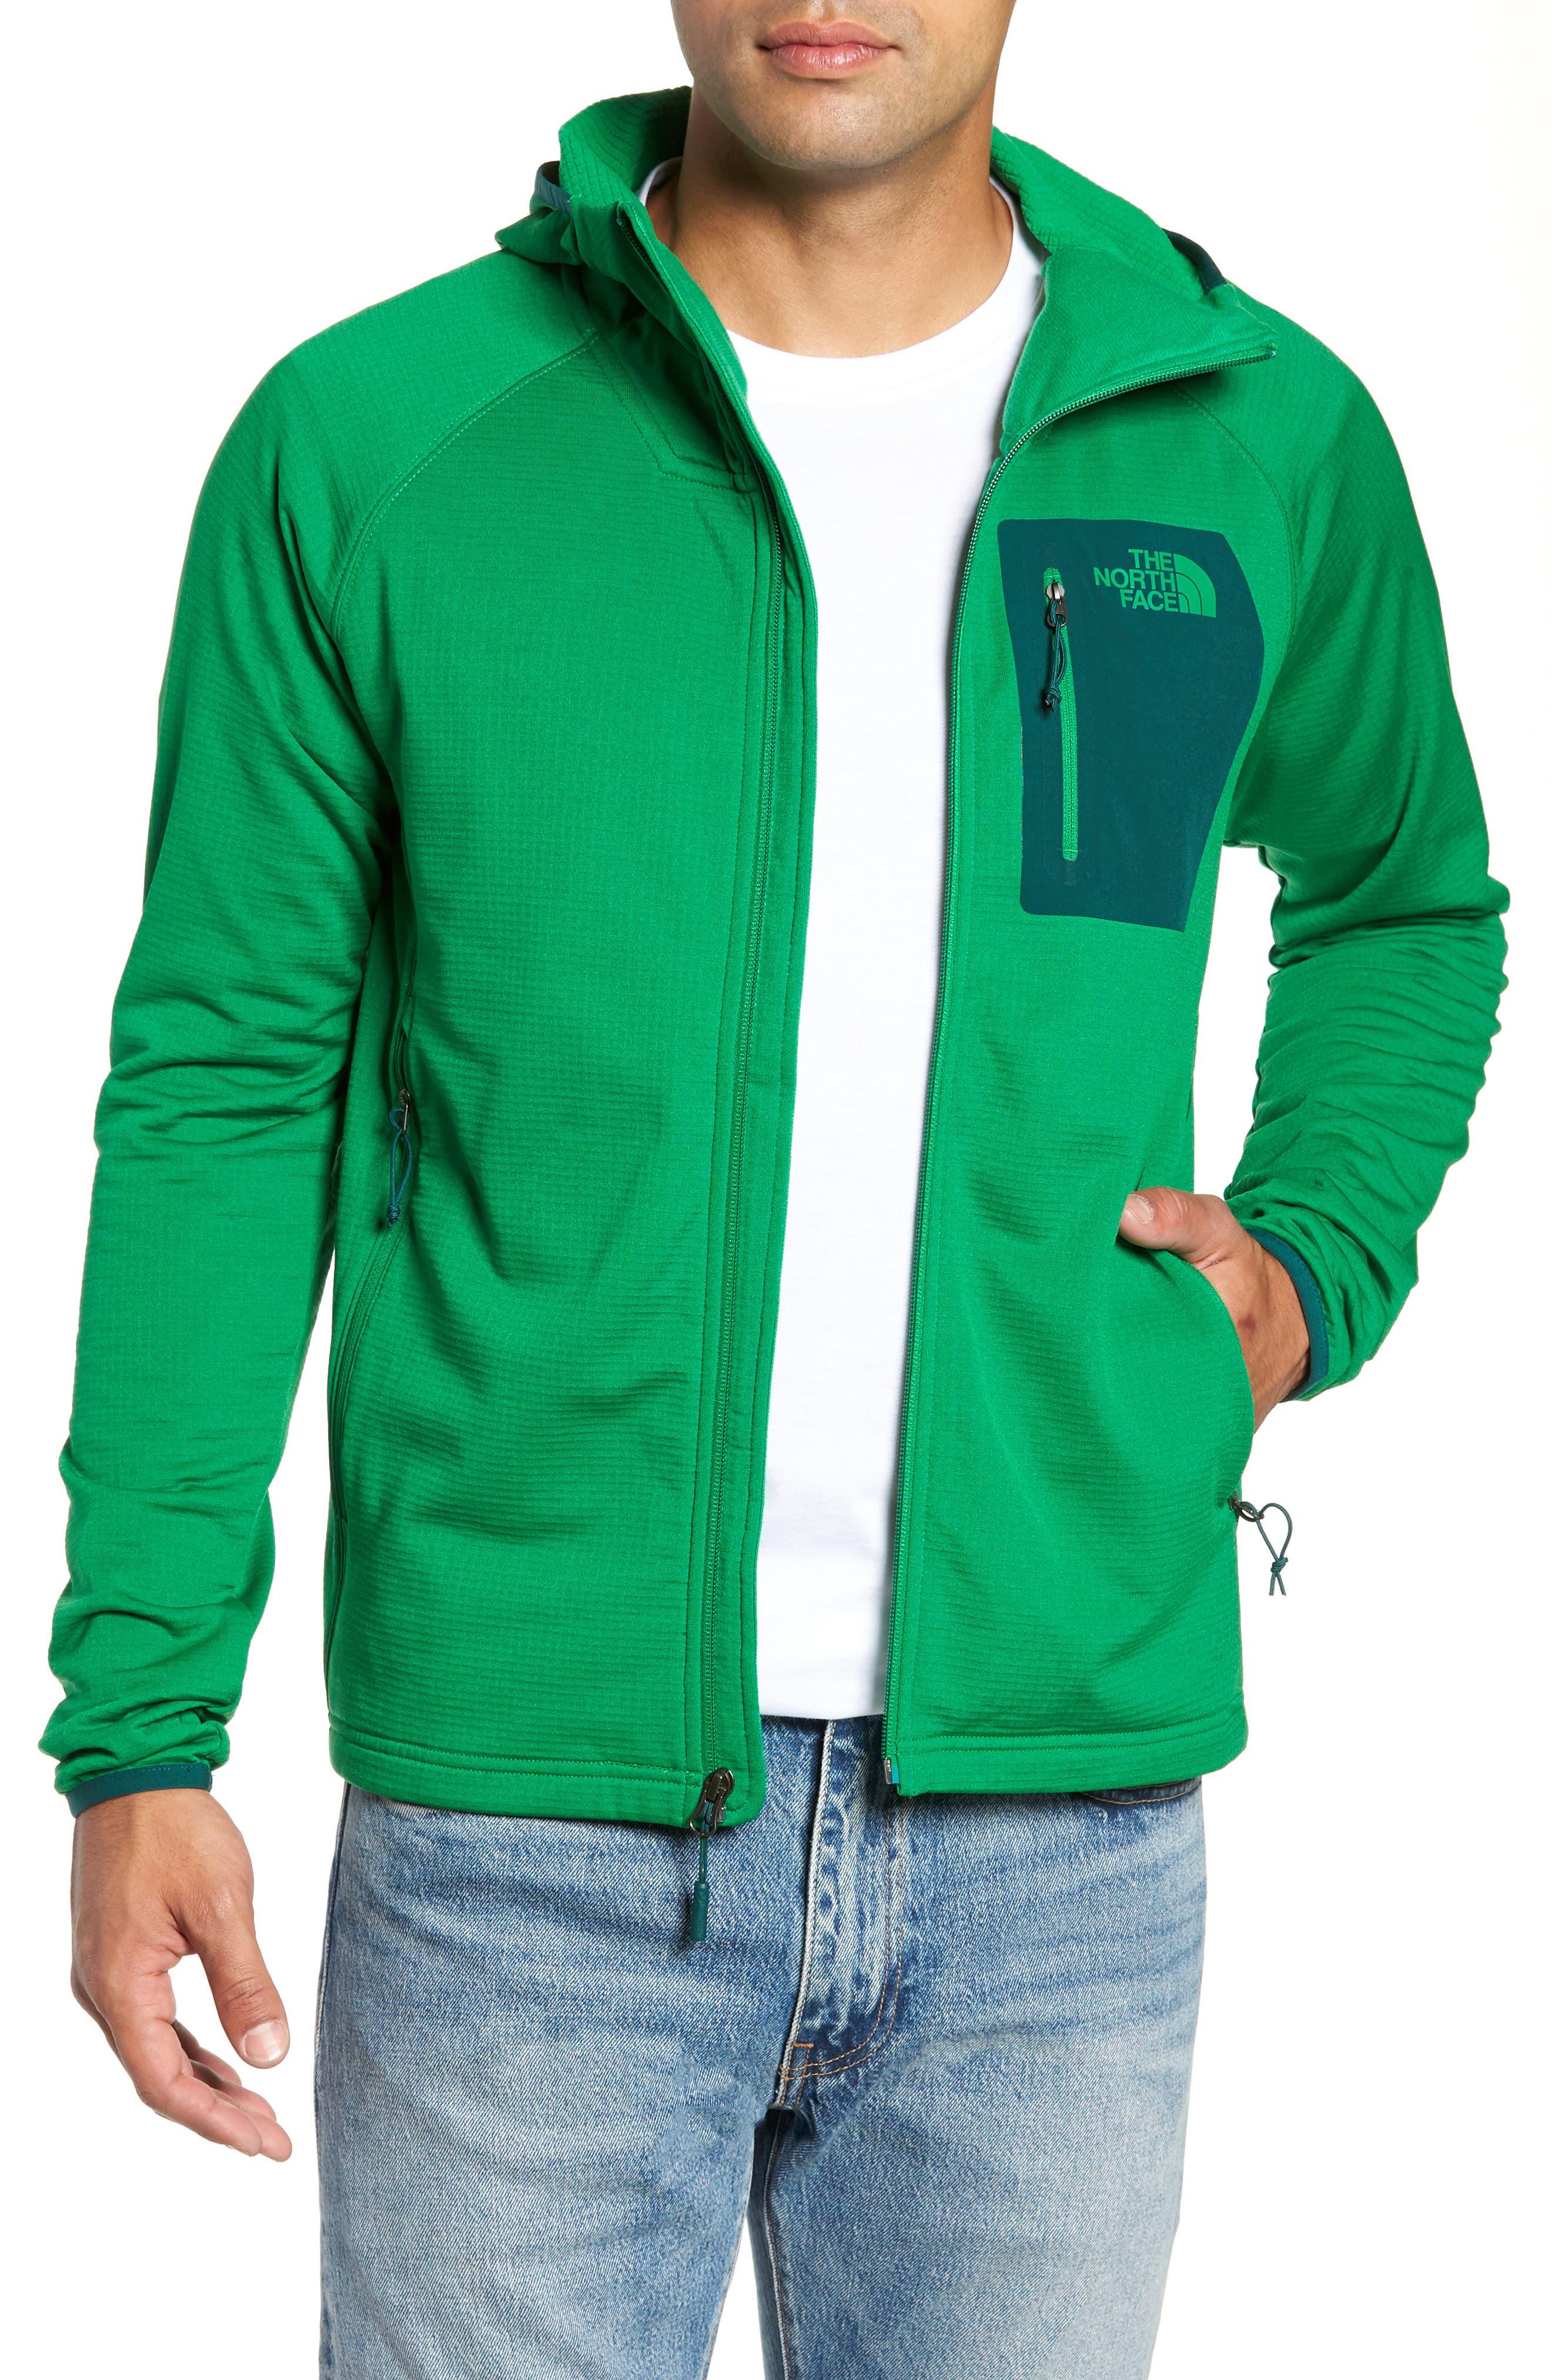 Borod Zip Fleece Jacket,                             Main thumbnail 1, color,                             PRIMARY GREEN/GARDEN GREEN